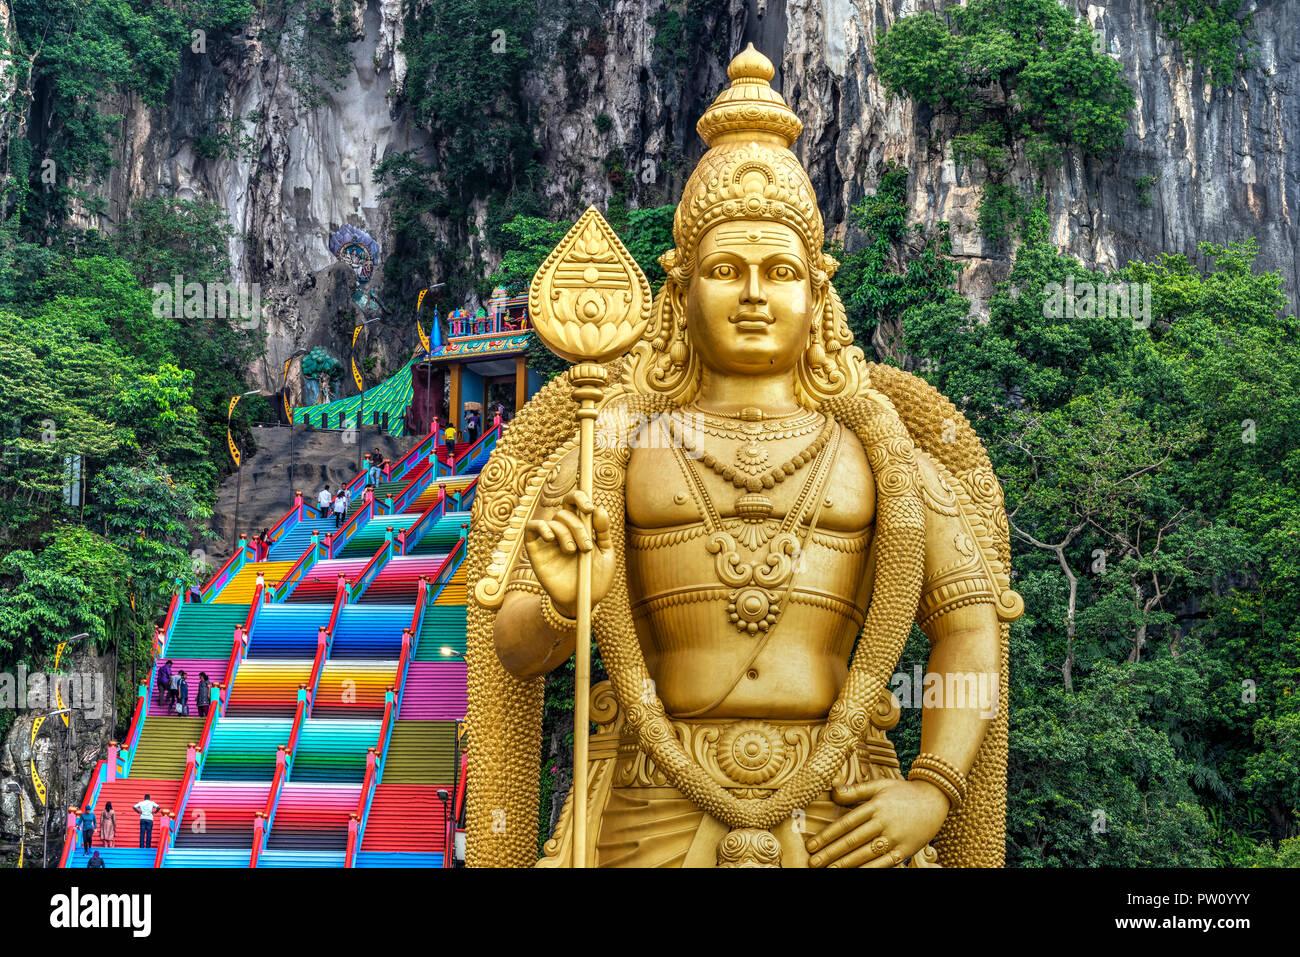 Ingresso Grotte Batu con la statua Murugan, Selangor, Kuala Lumpur, Malesia Immagini Stock